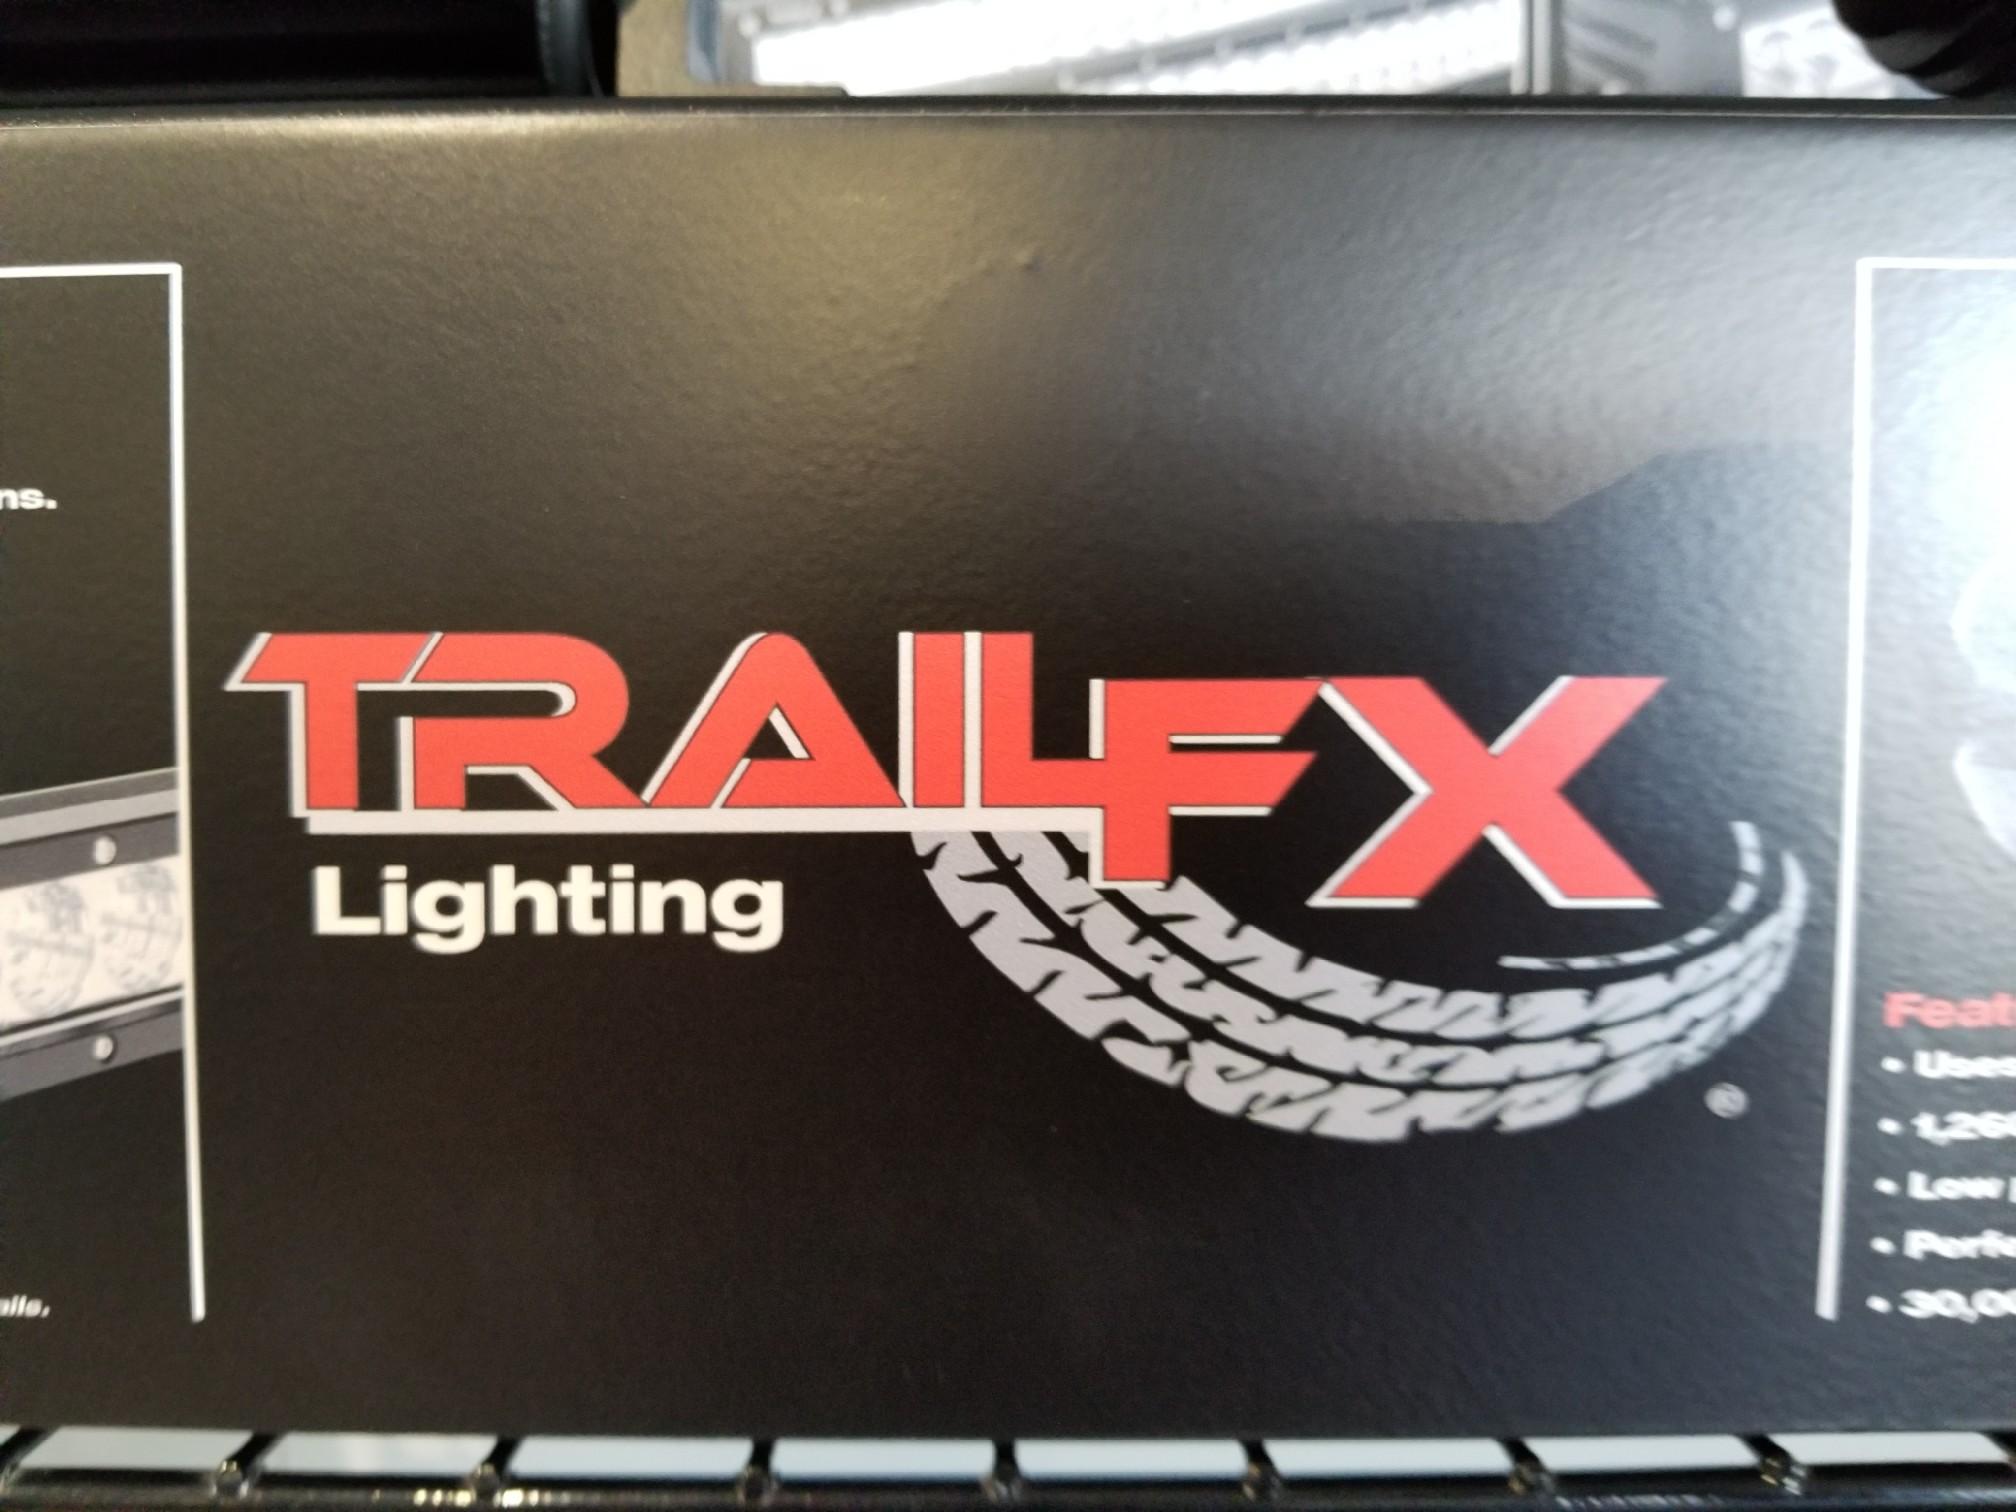 Trail FX Lighting